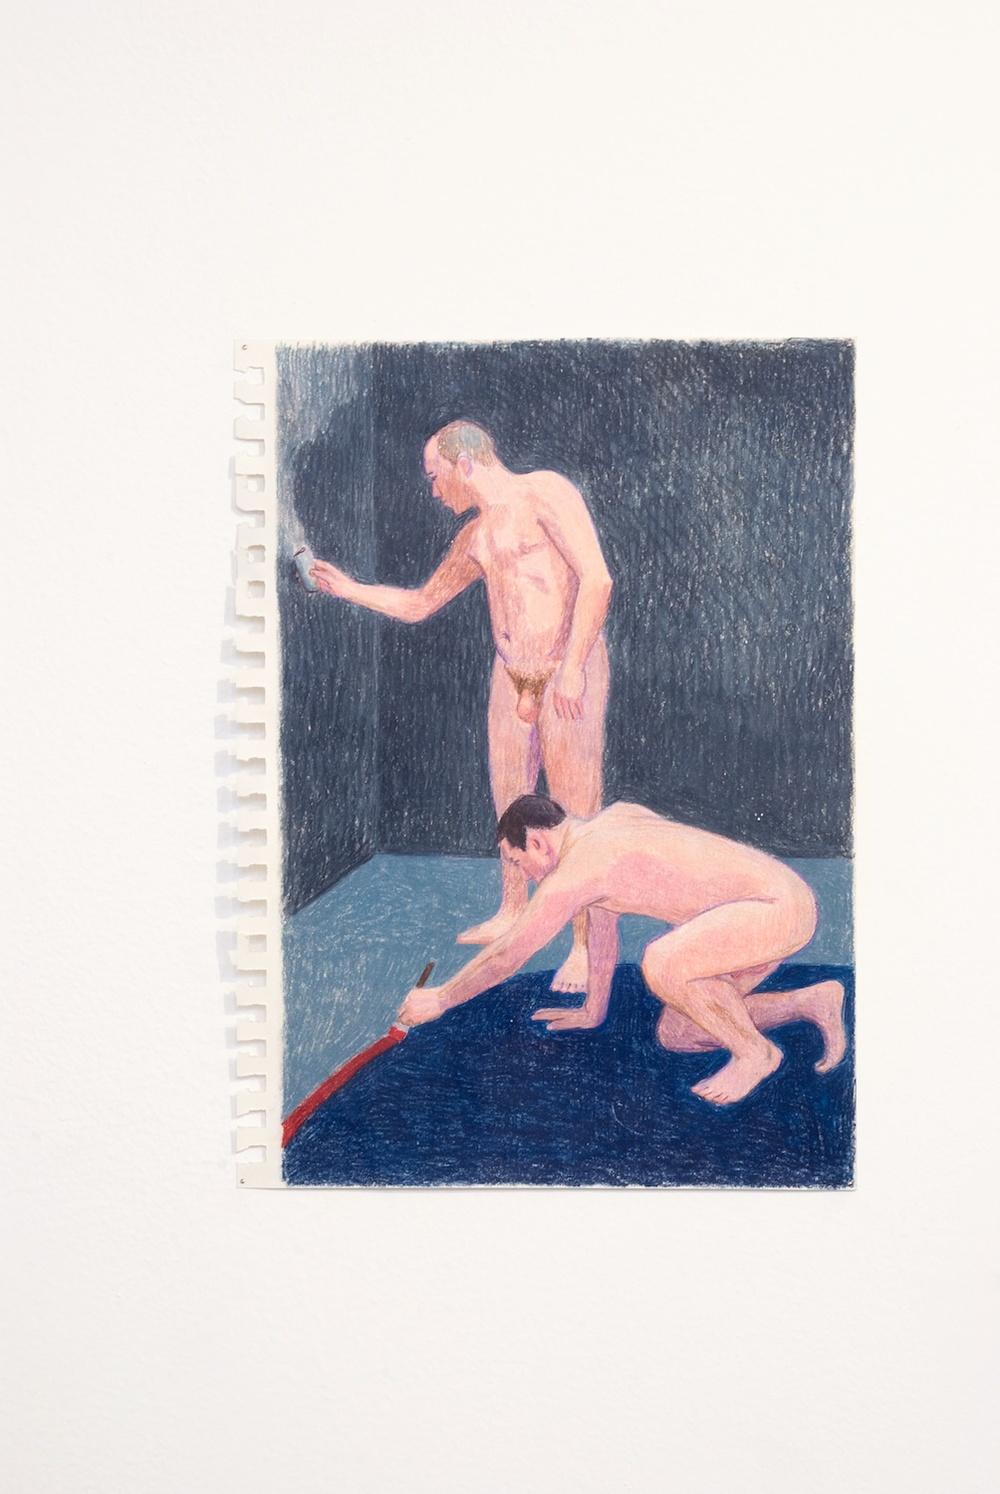 Elijah Burgher  Preparing a ritual space 1  2009 Colored pencil on paper 12h x 8w in EB010